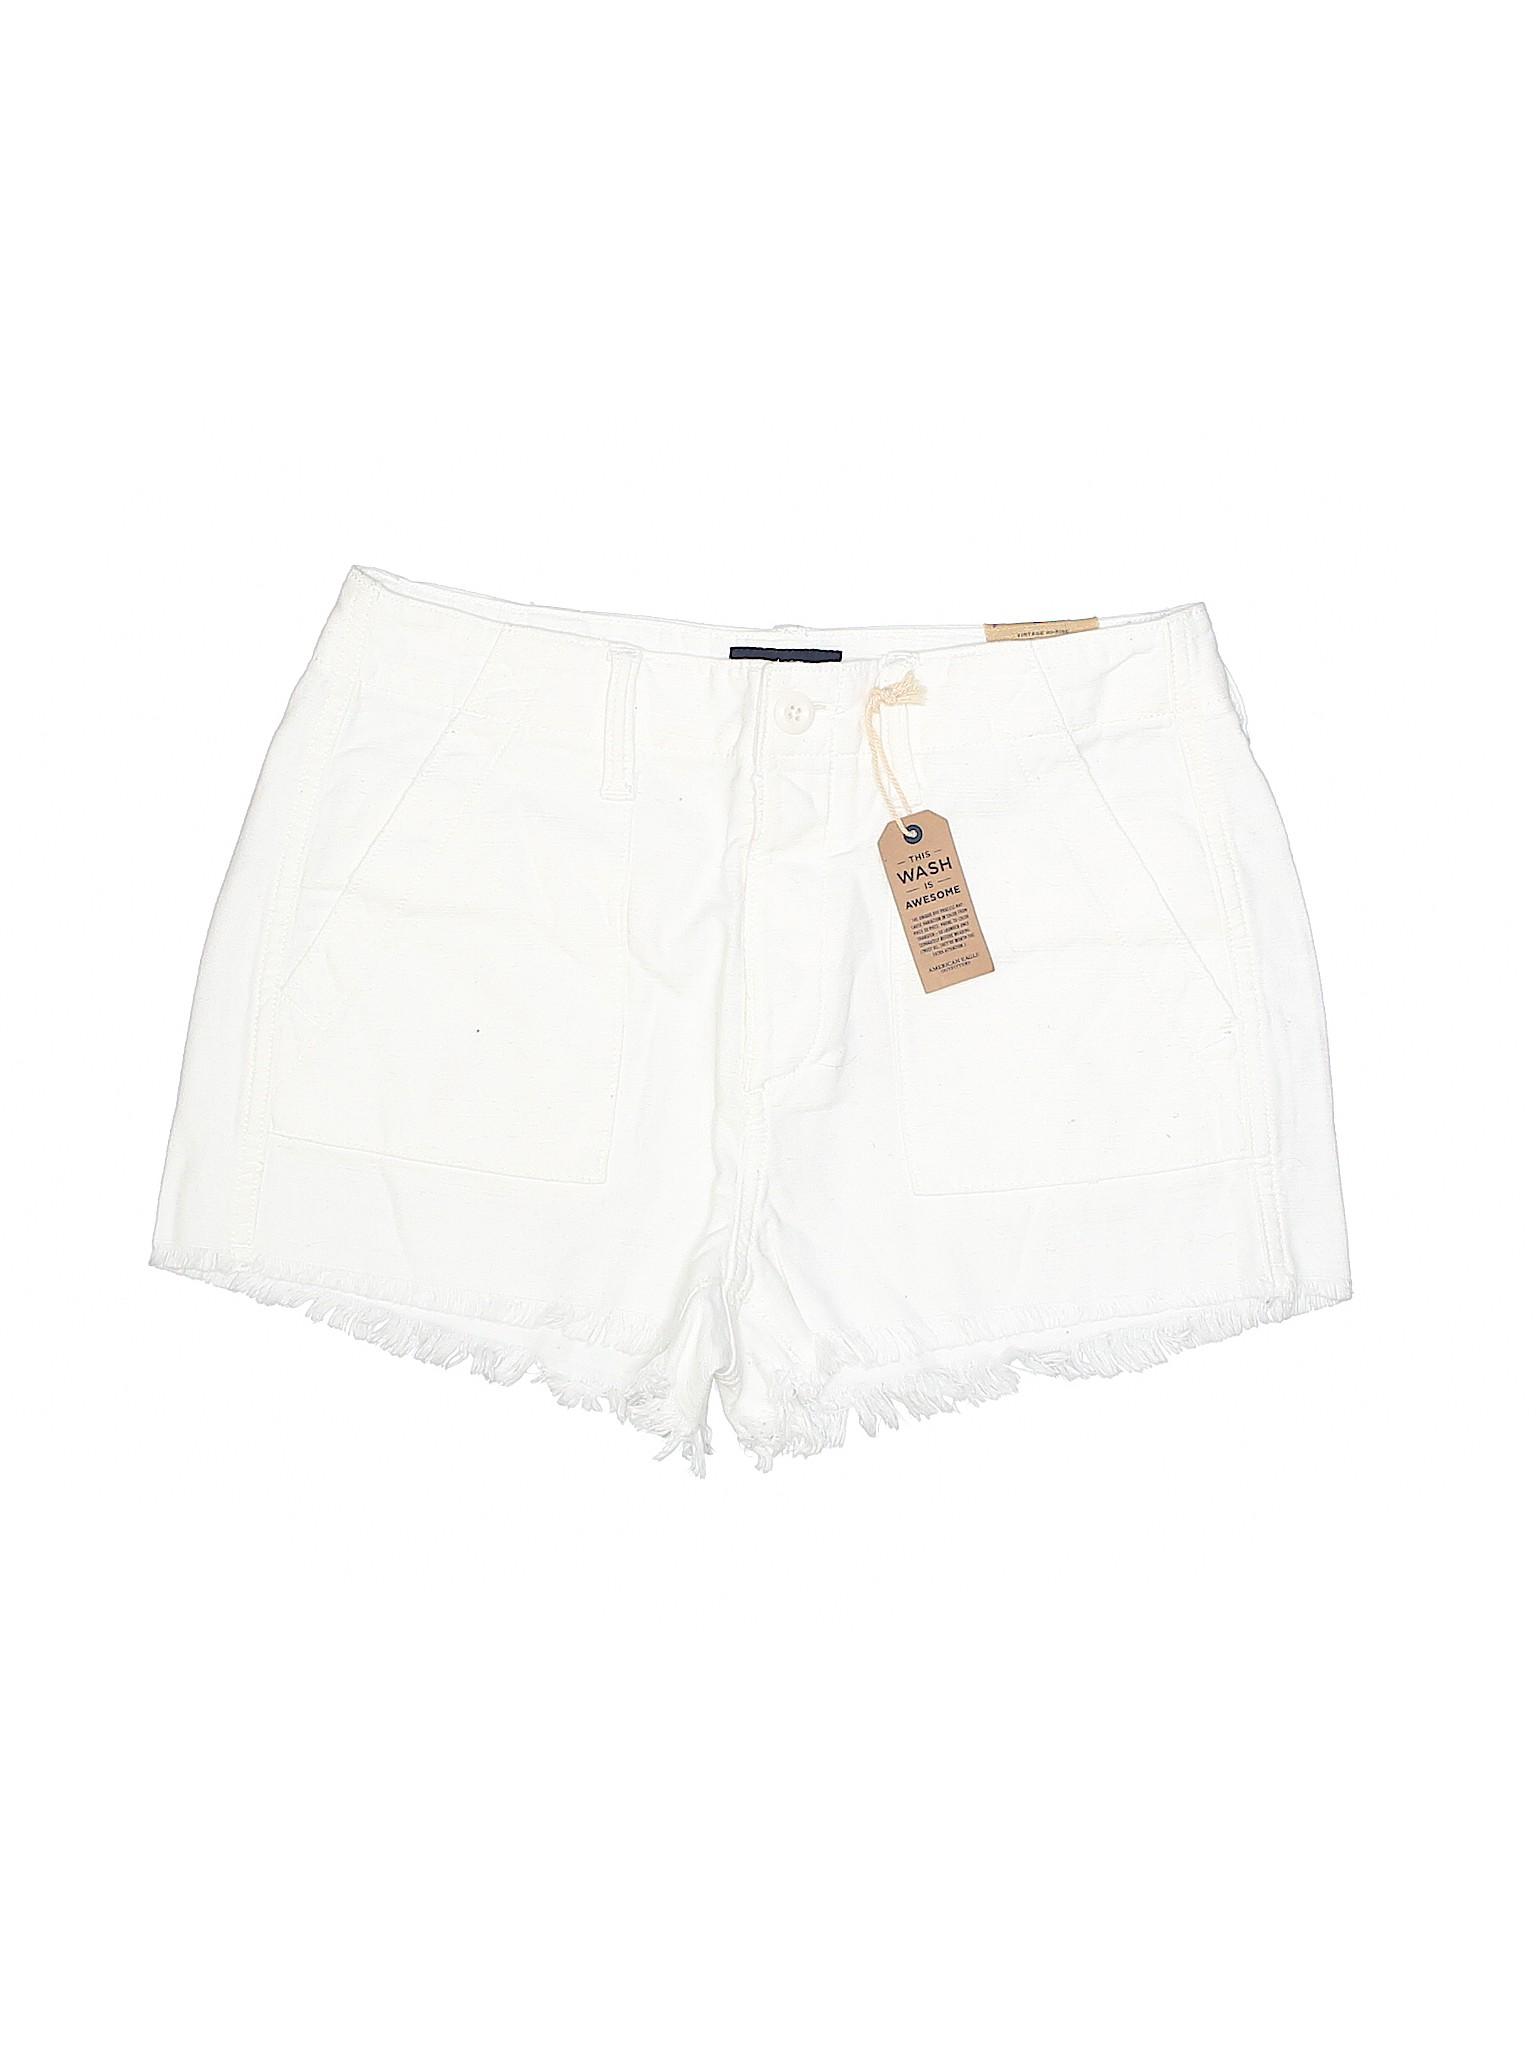 Boutique Shorts American Khaki Eagle Outfitters Z7qYzr7H